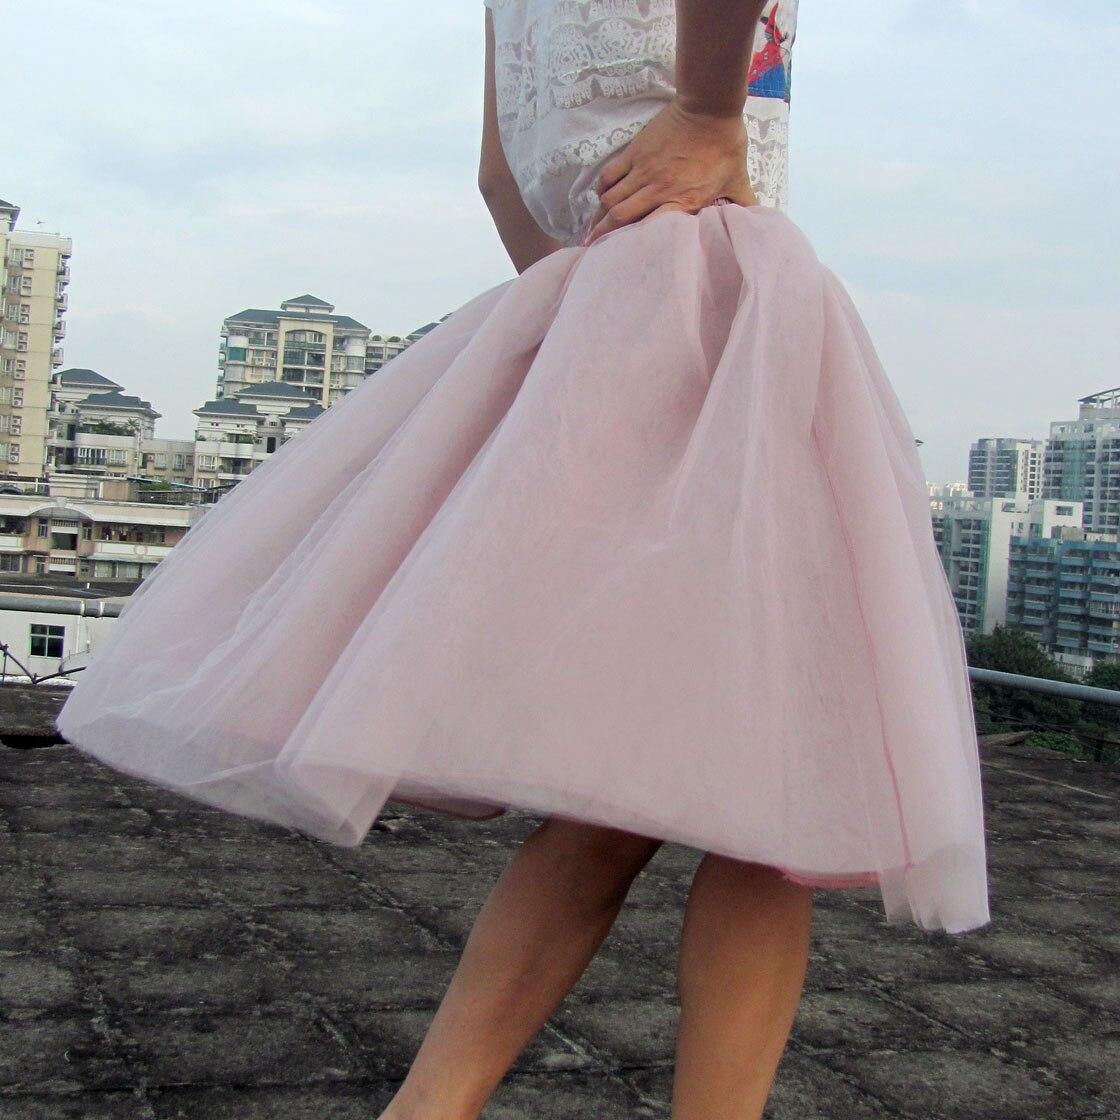 Spring Tutu Skirt Women Girls Princess Fluffy Pleated Womens Jupe Femme Faldas Rokken Summer Custom Made 7 Layers Tulle Skirts 2